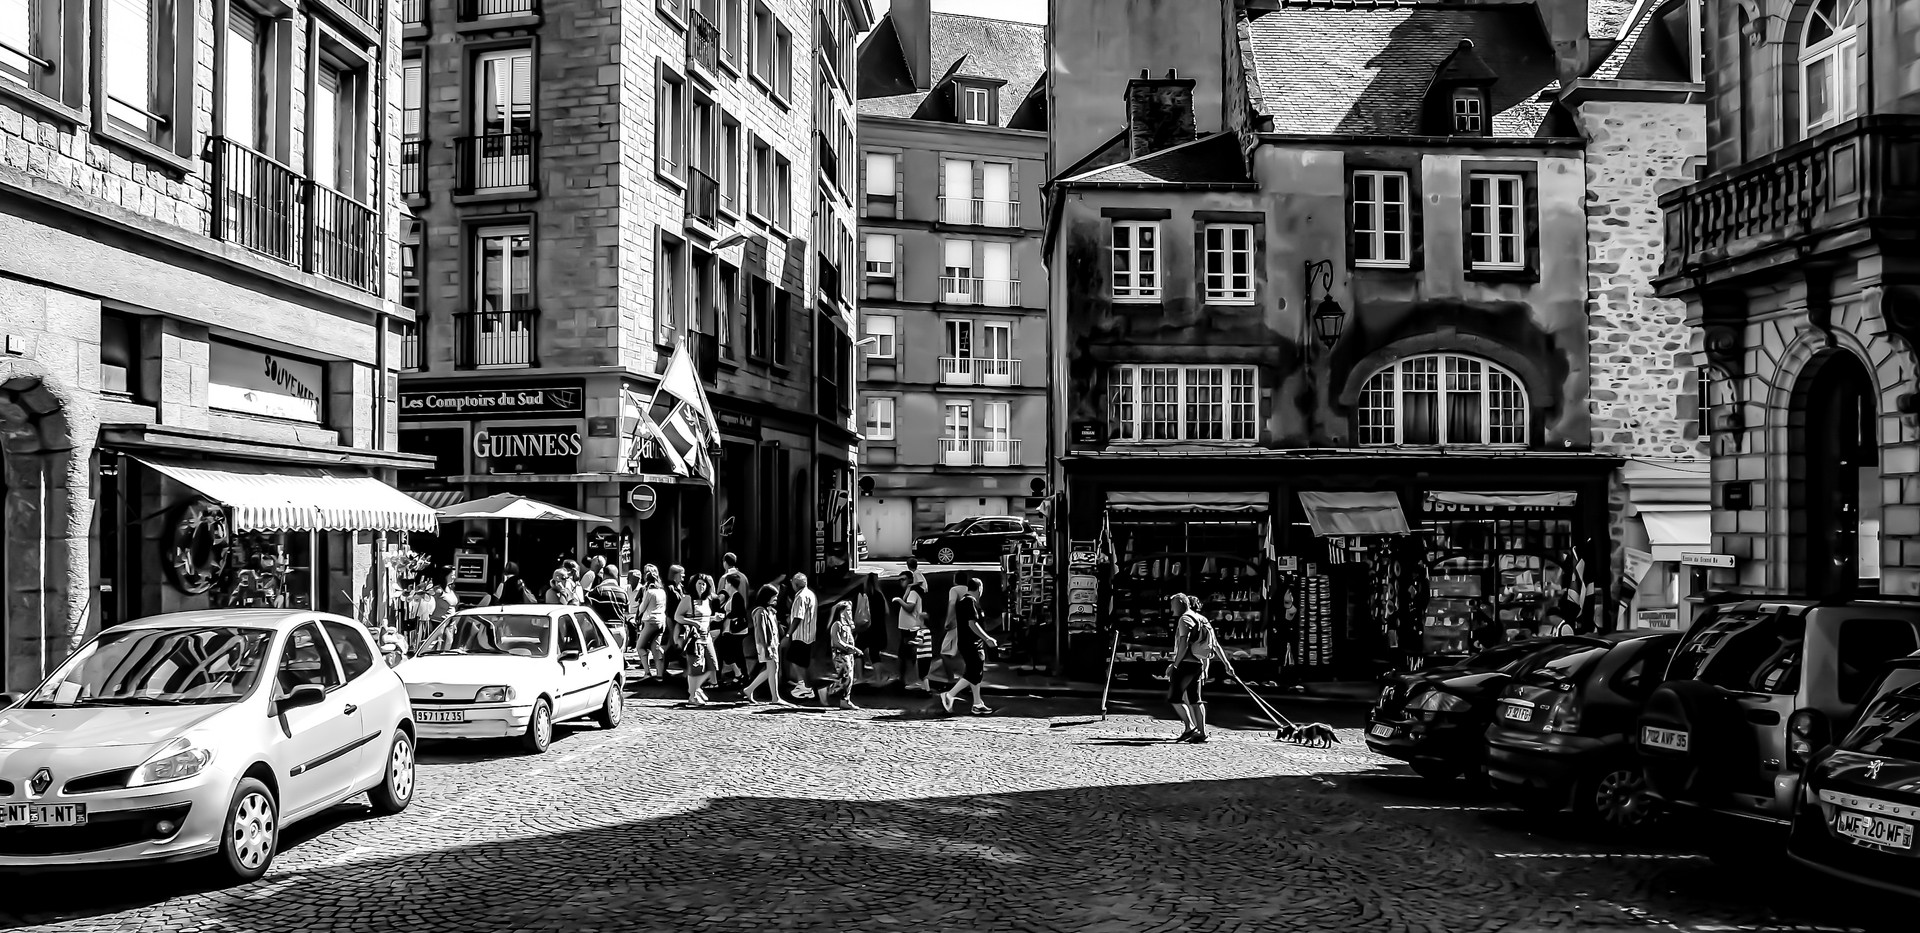 St Malo.jpg